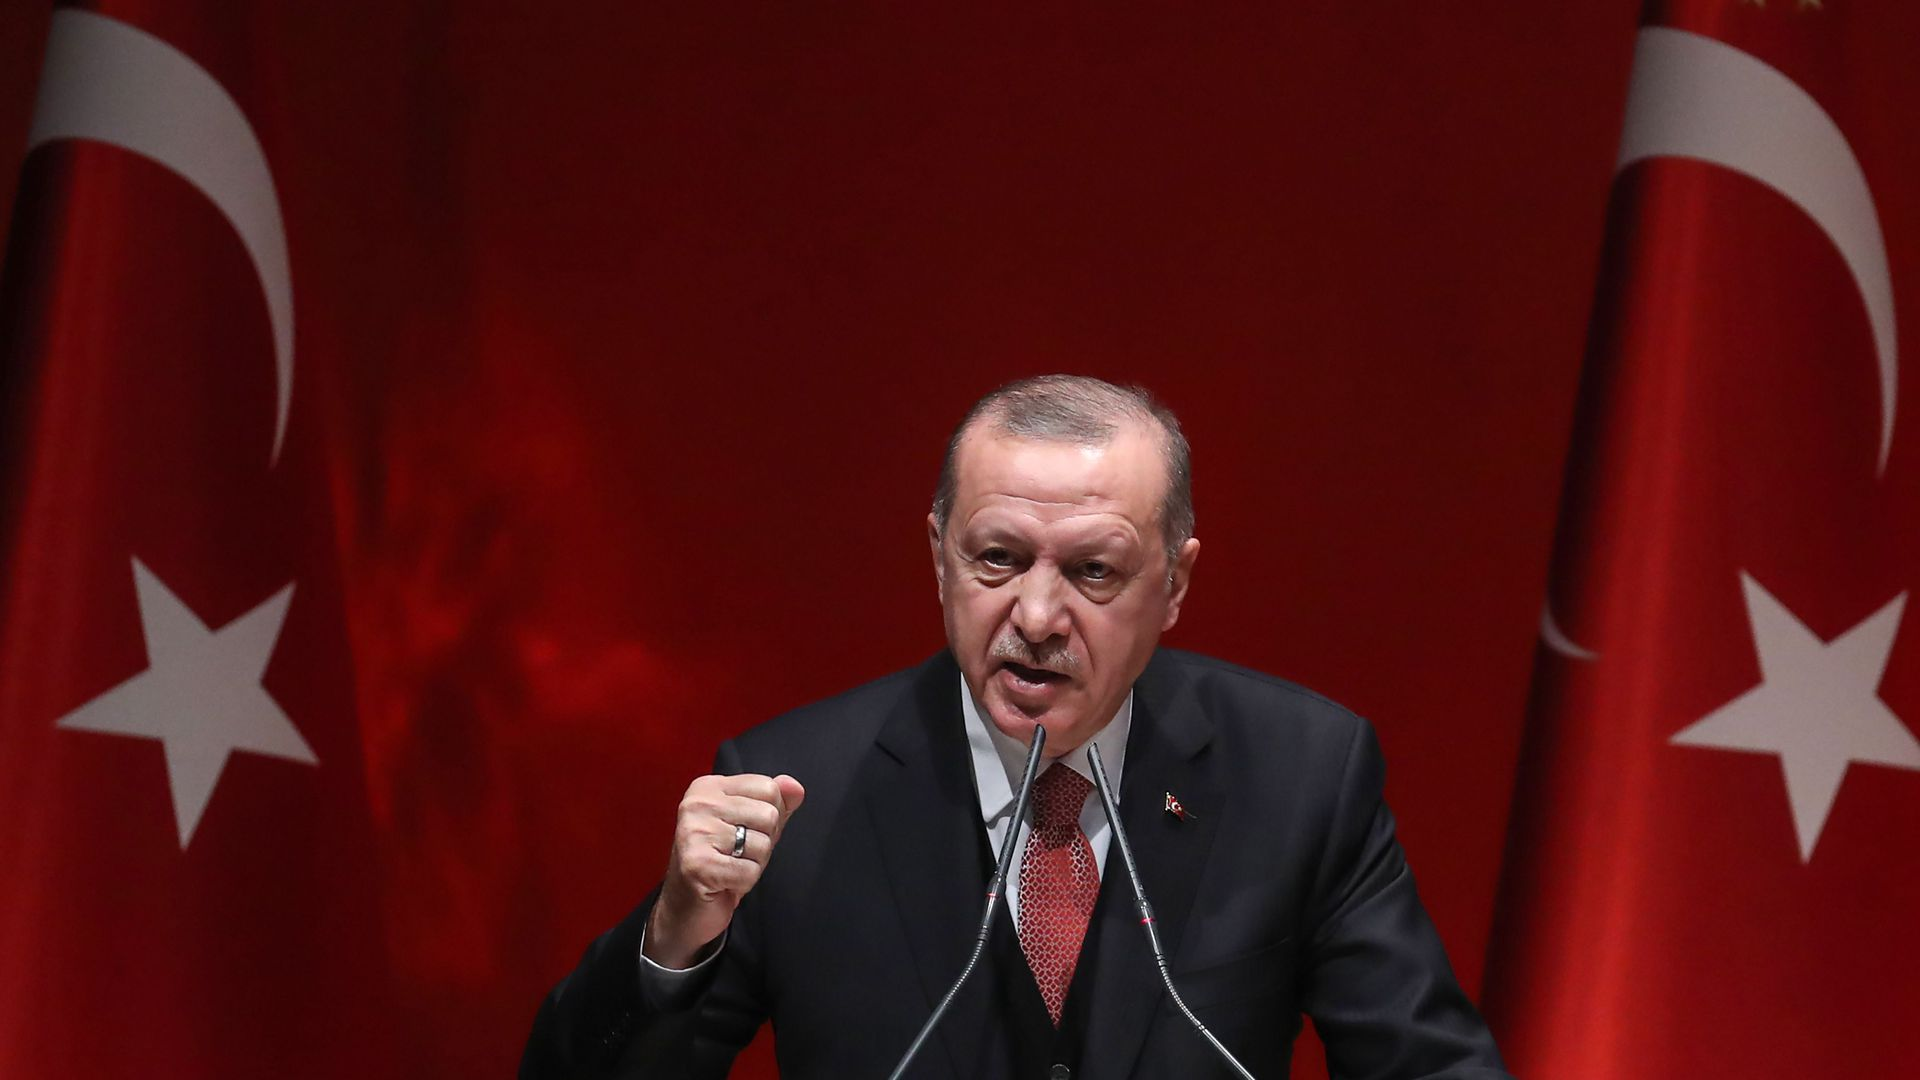 Turkey's president Recep Tayyip Erdogan delivers a speech.